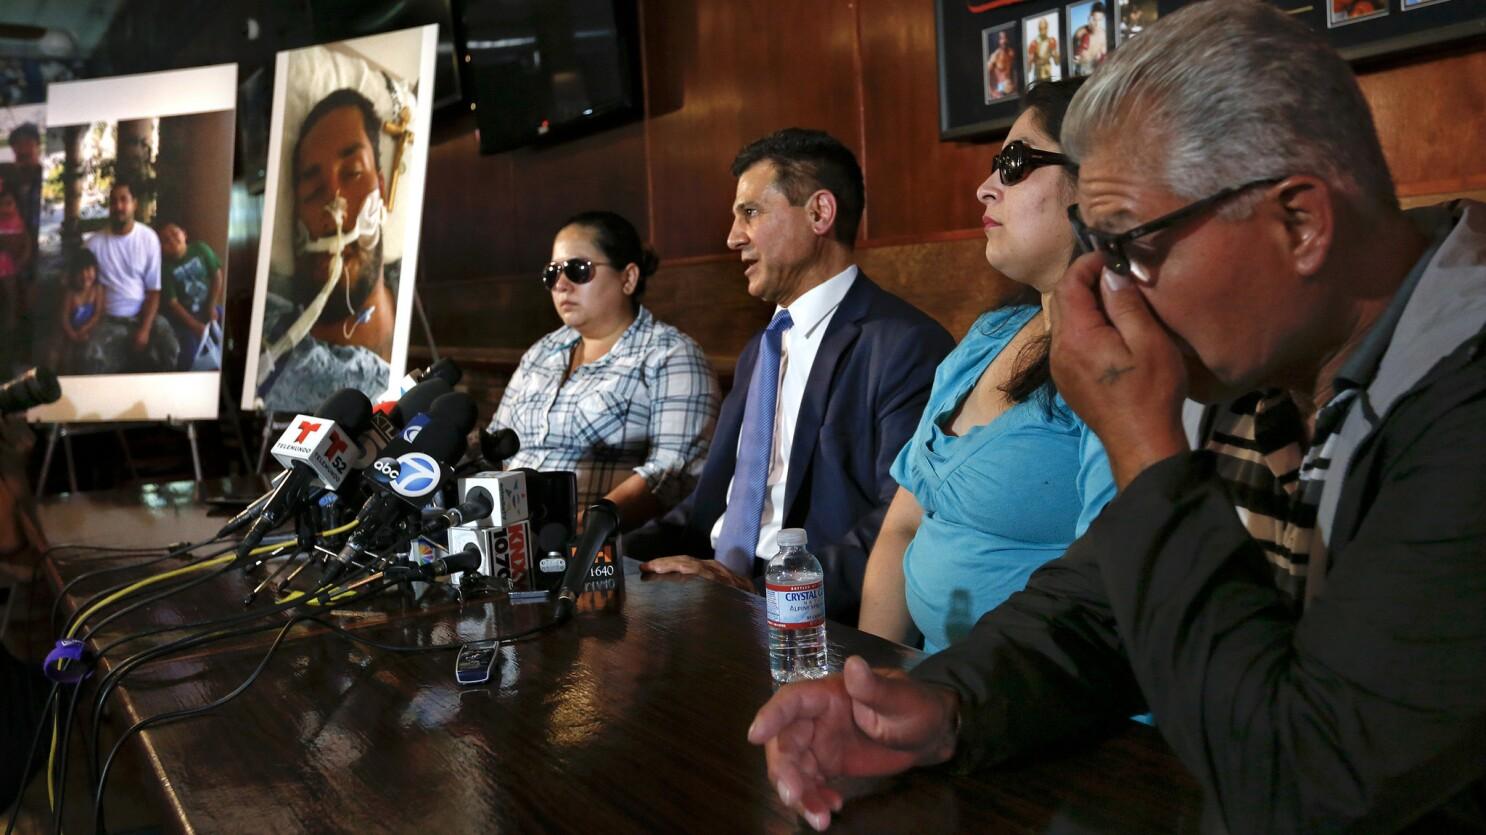 Anaheim police struck homeless man in chest with Taser